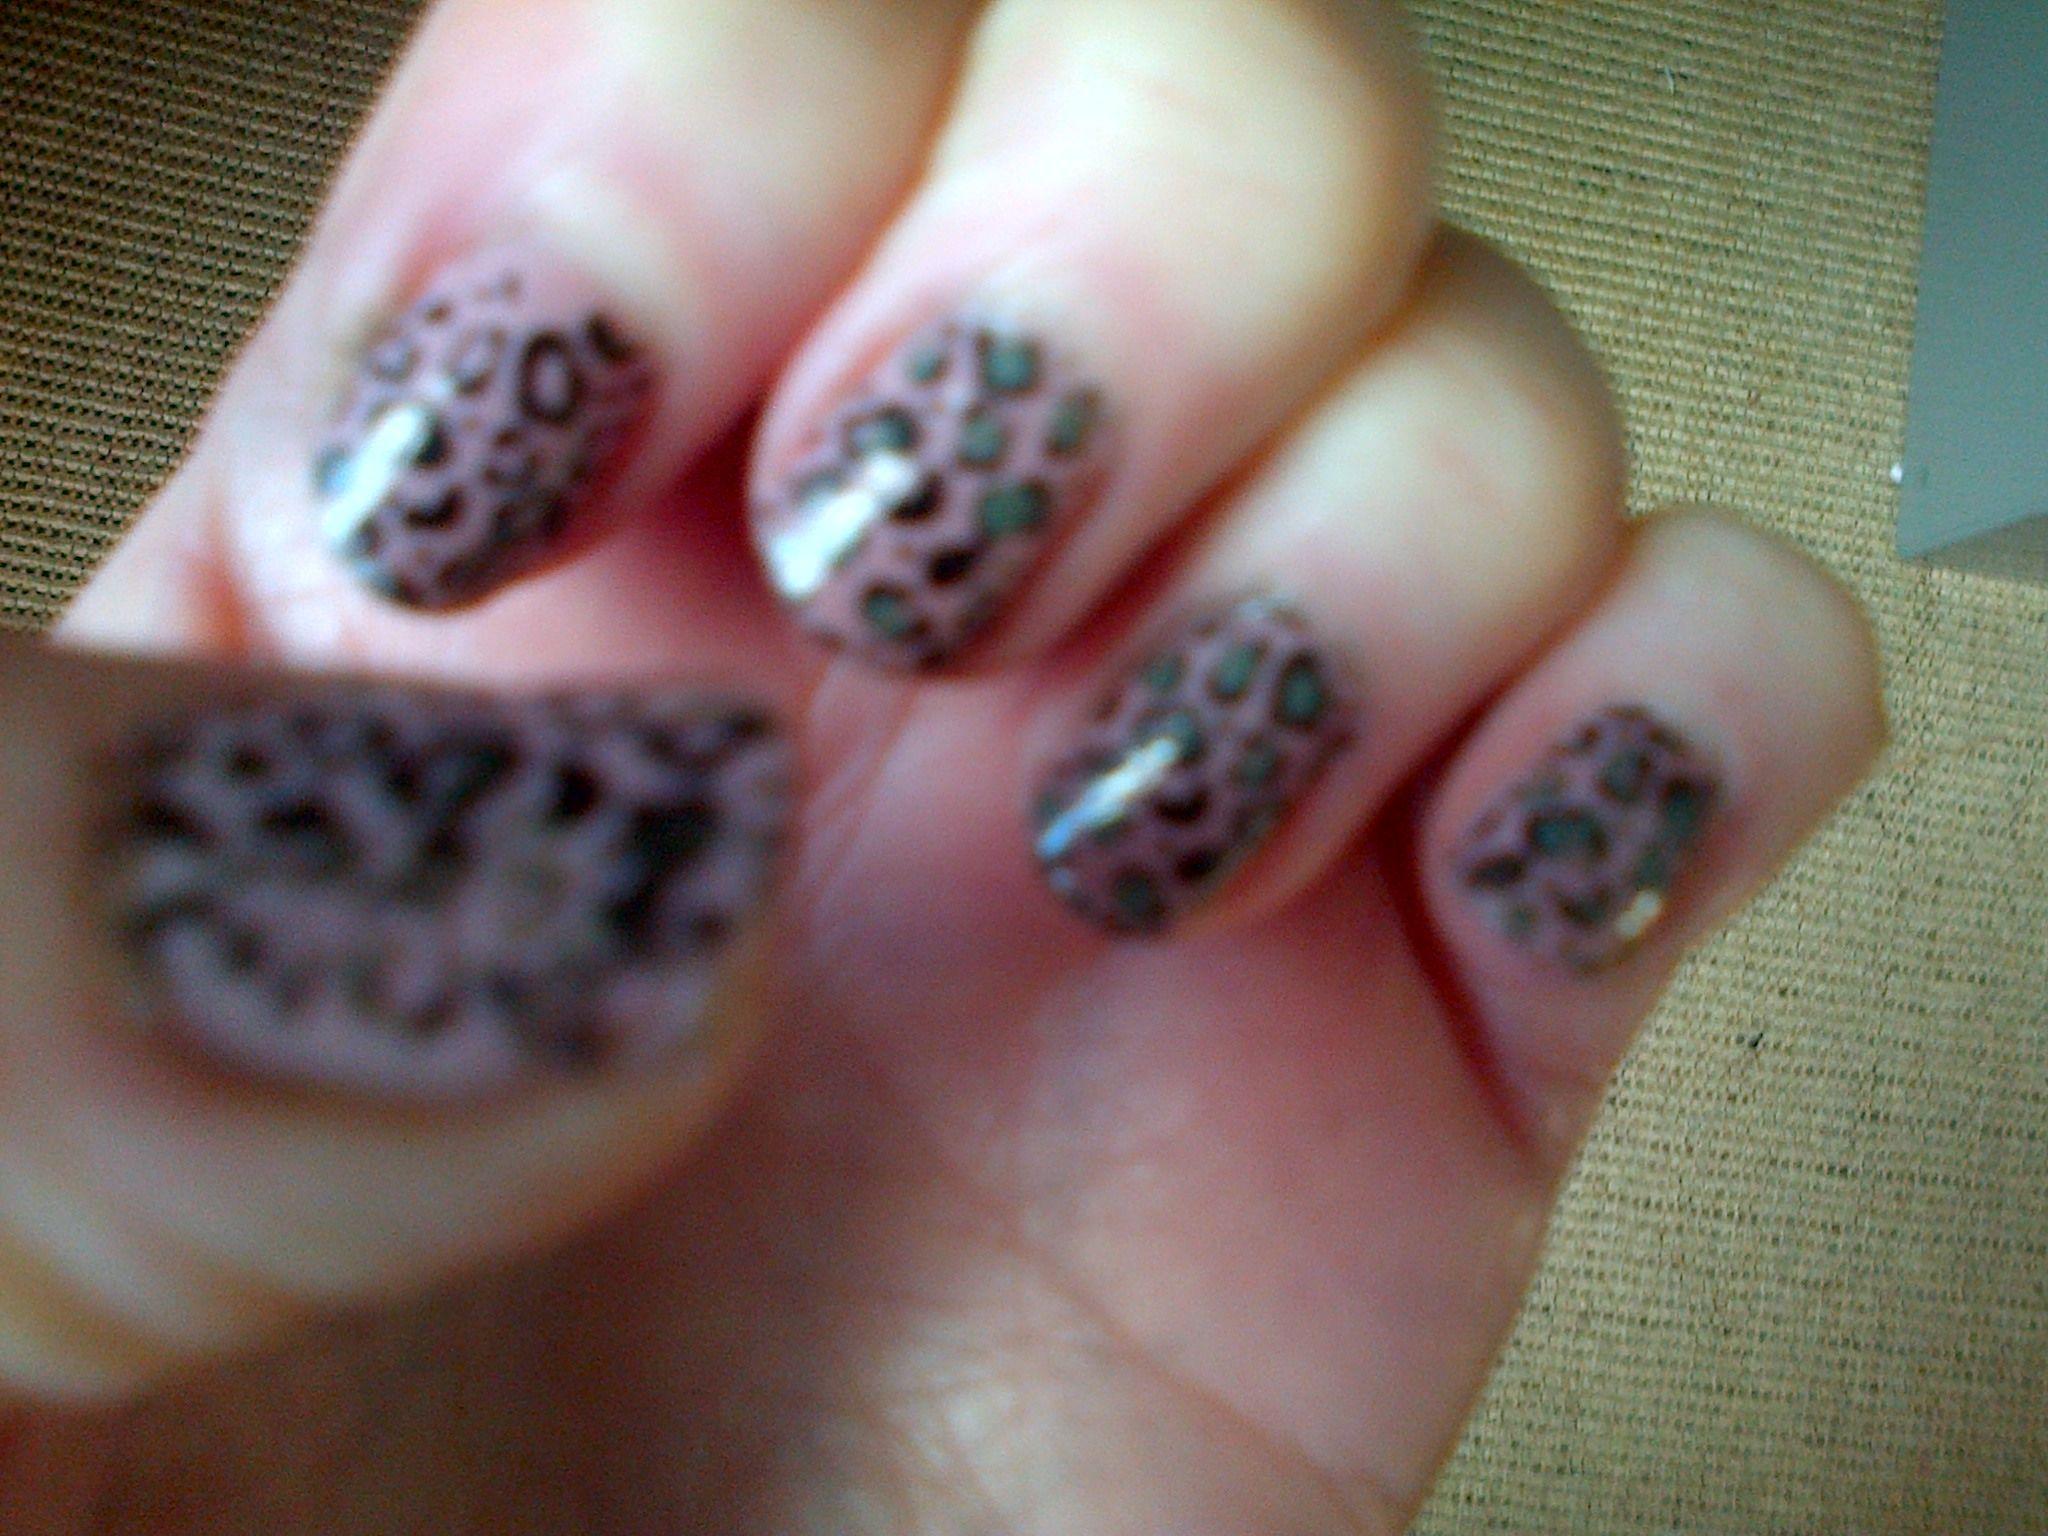 Leopard skin using konad stamper and dotting tool nail art